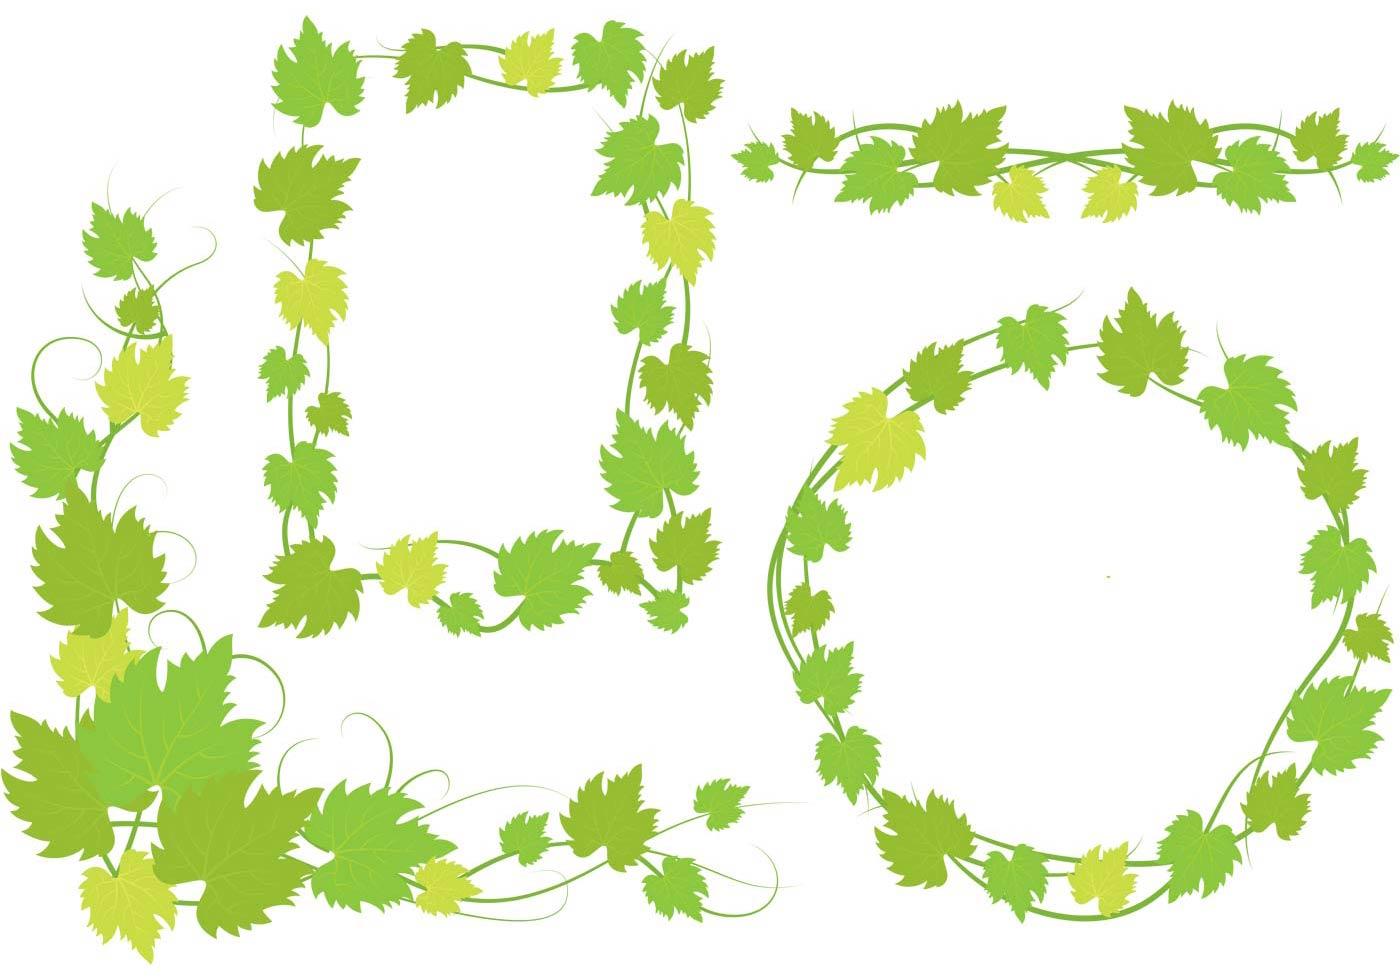 Ivy Vine Leaves Designs - Download Free Vectors, Clipart ...